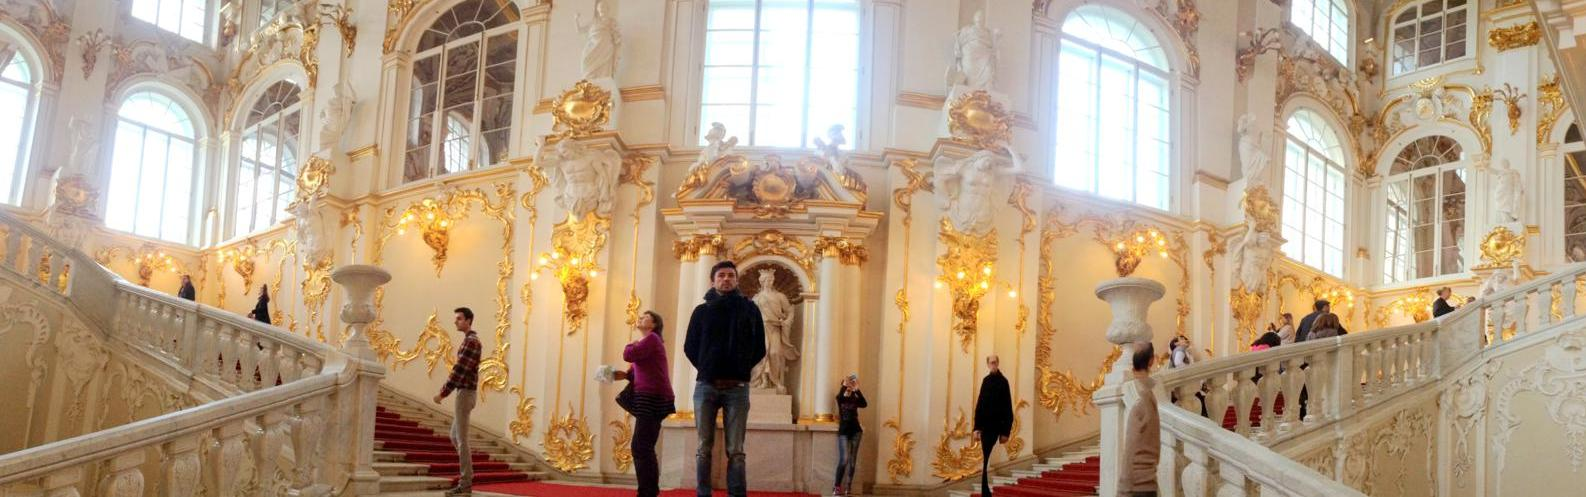 hermitage-san-petersburgo